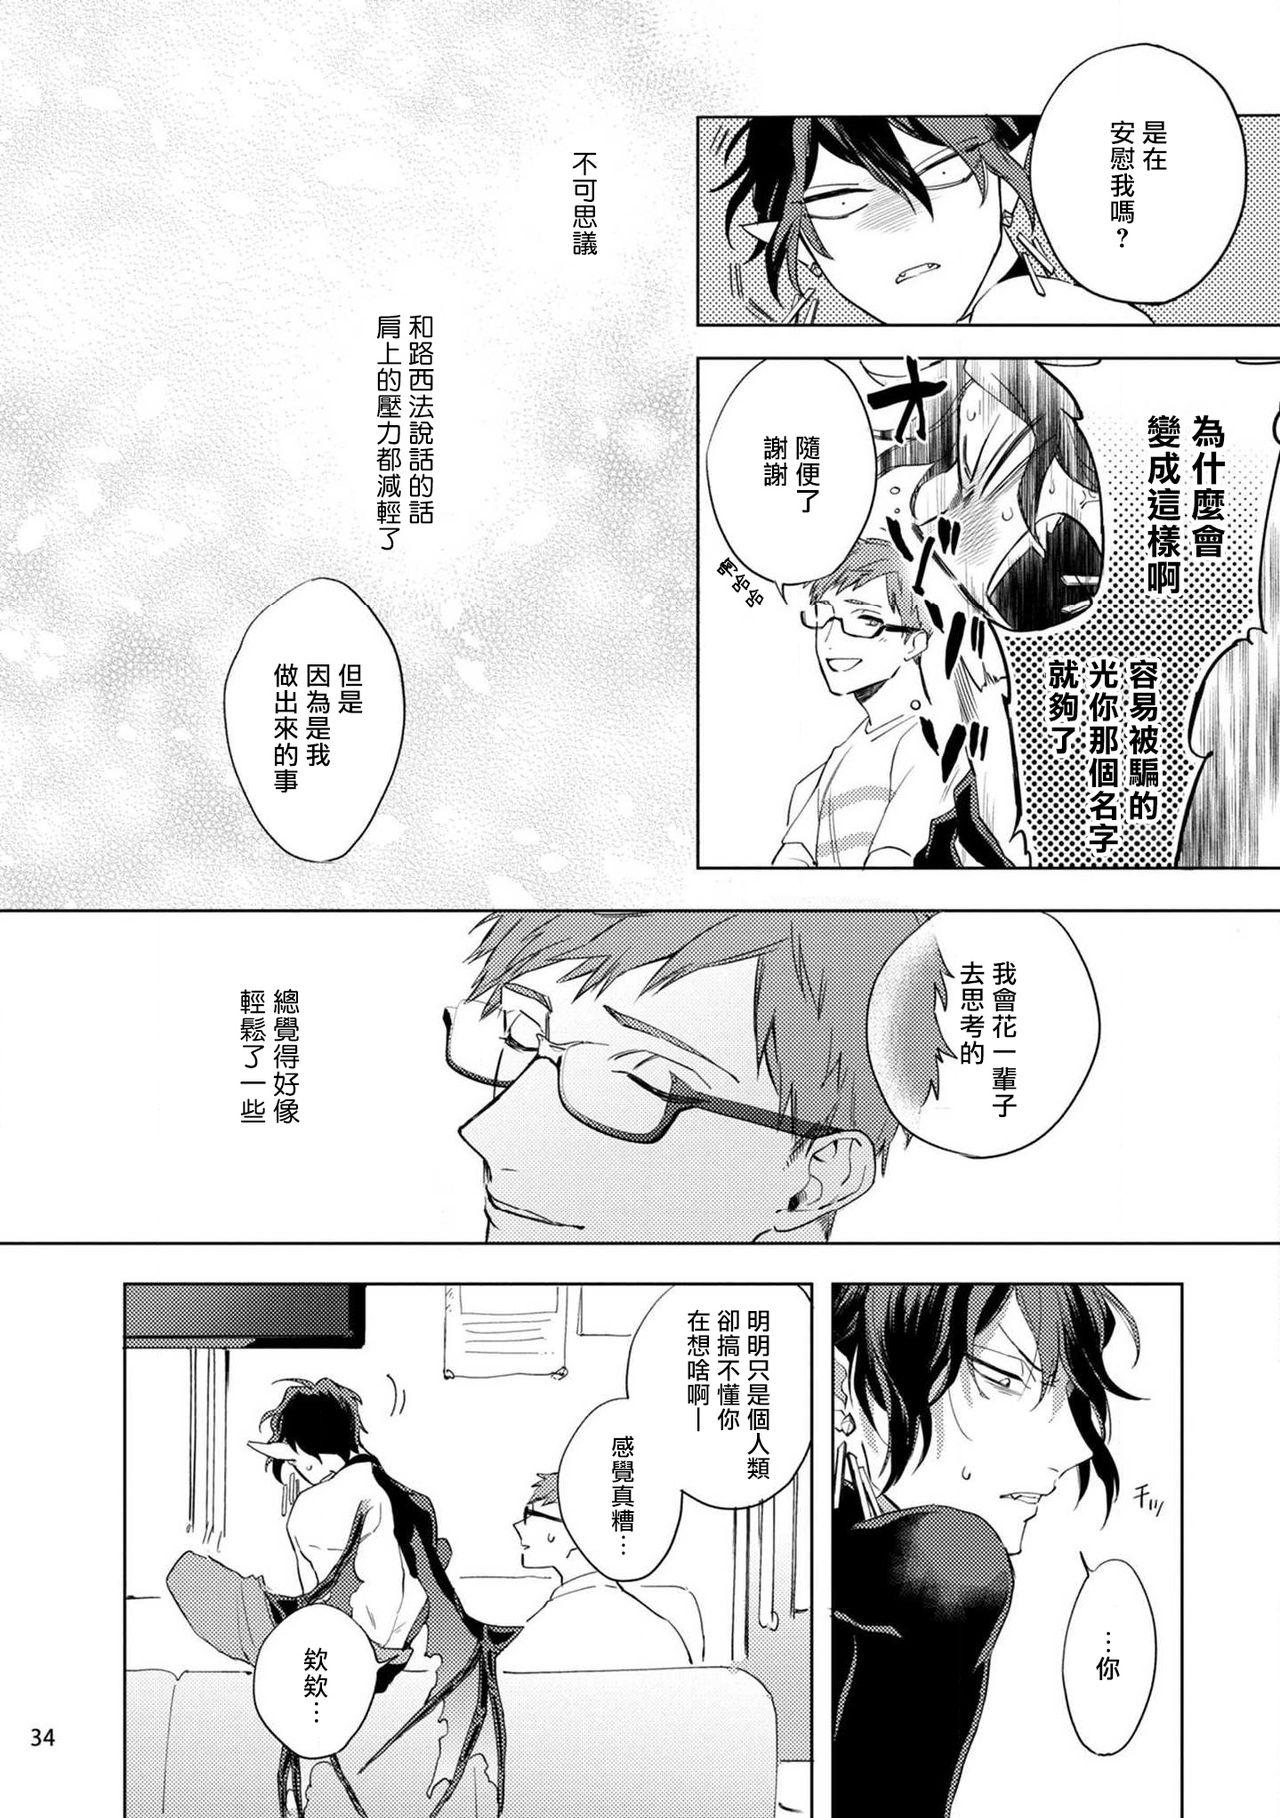 [Yao] Inma-sama ni Hallelujah!   赞美淫魔大人! Ch. 1-3 [Chinese] [拾荒者汉化组] [Digital] 104